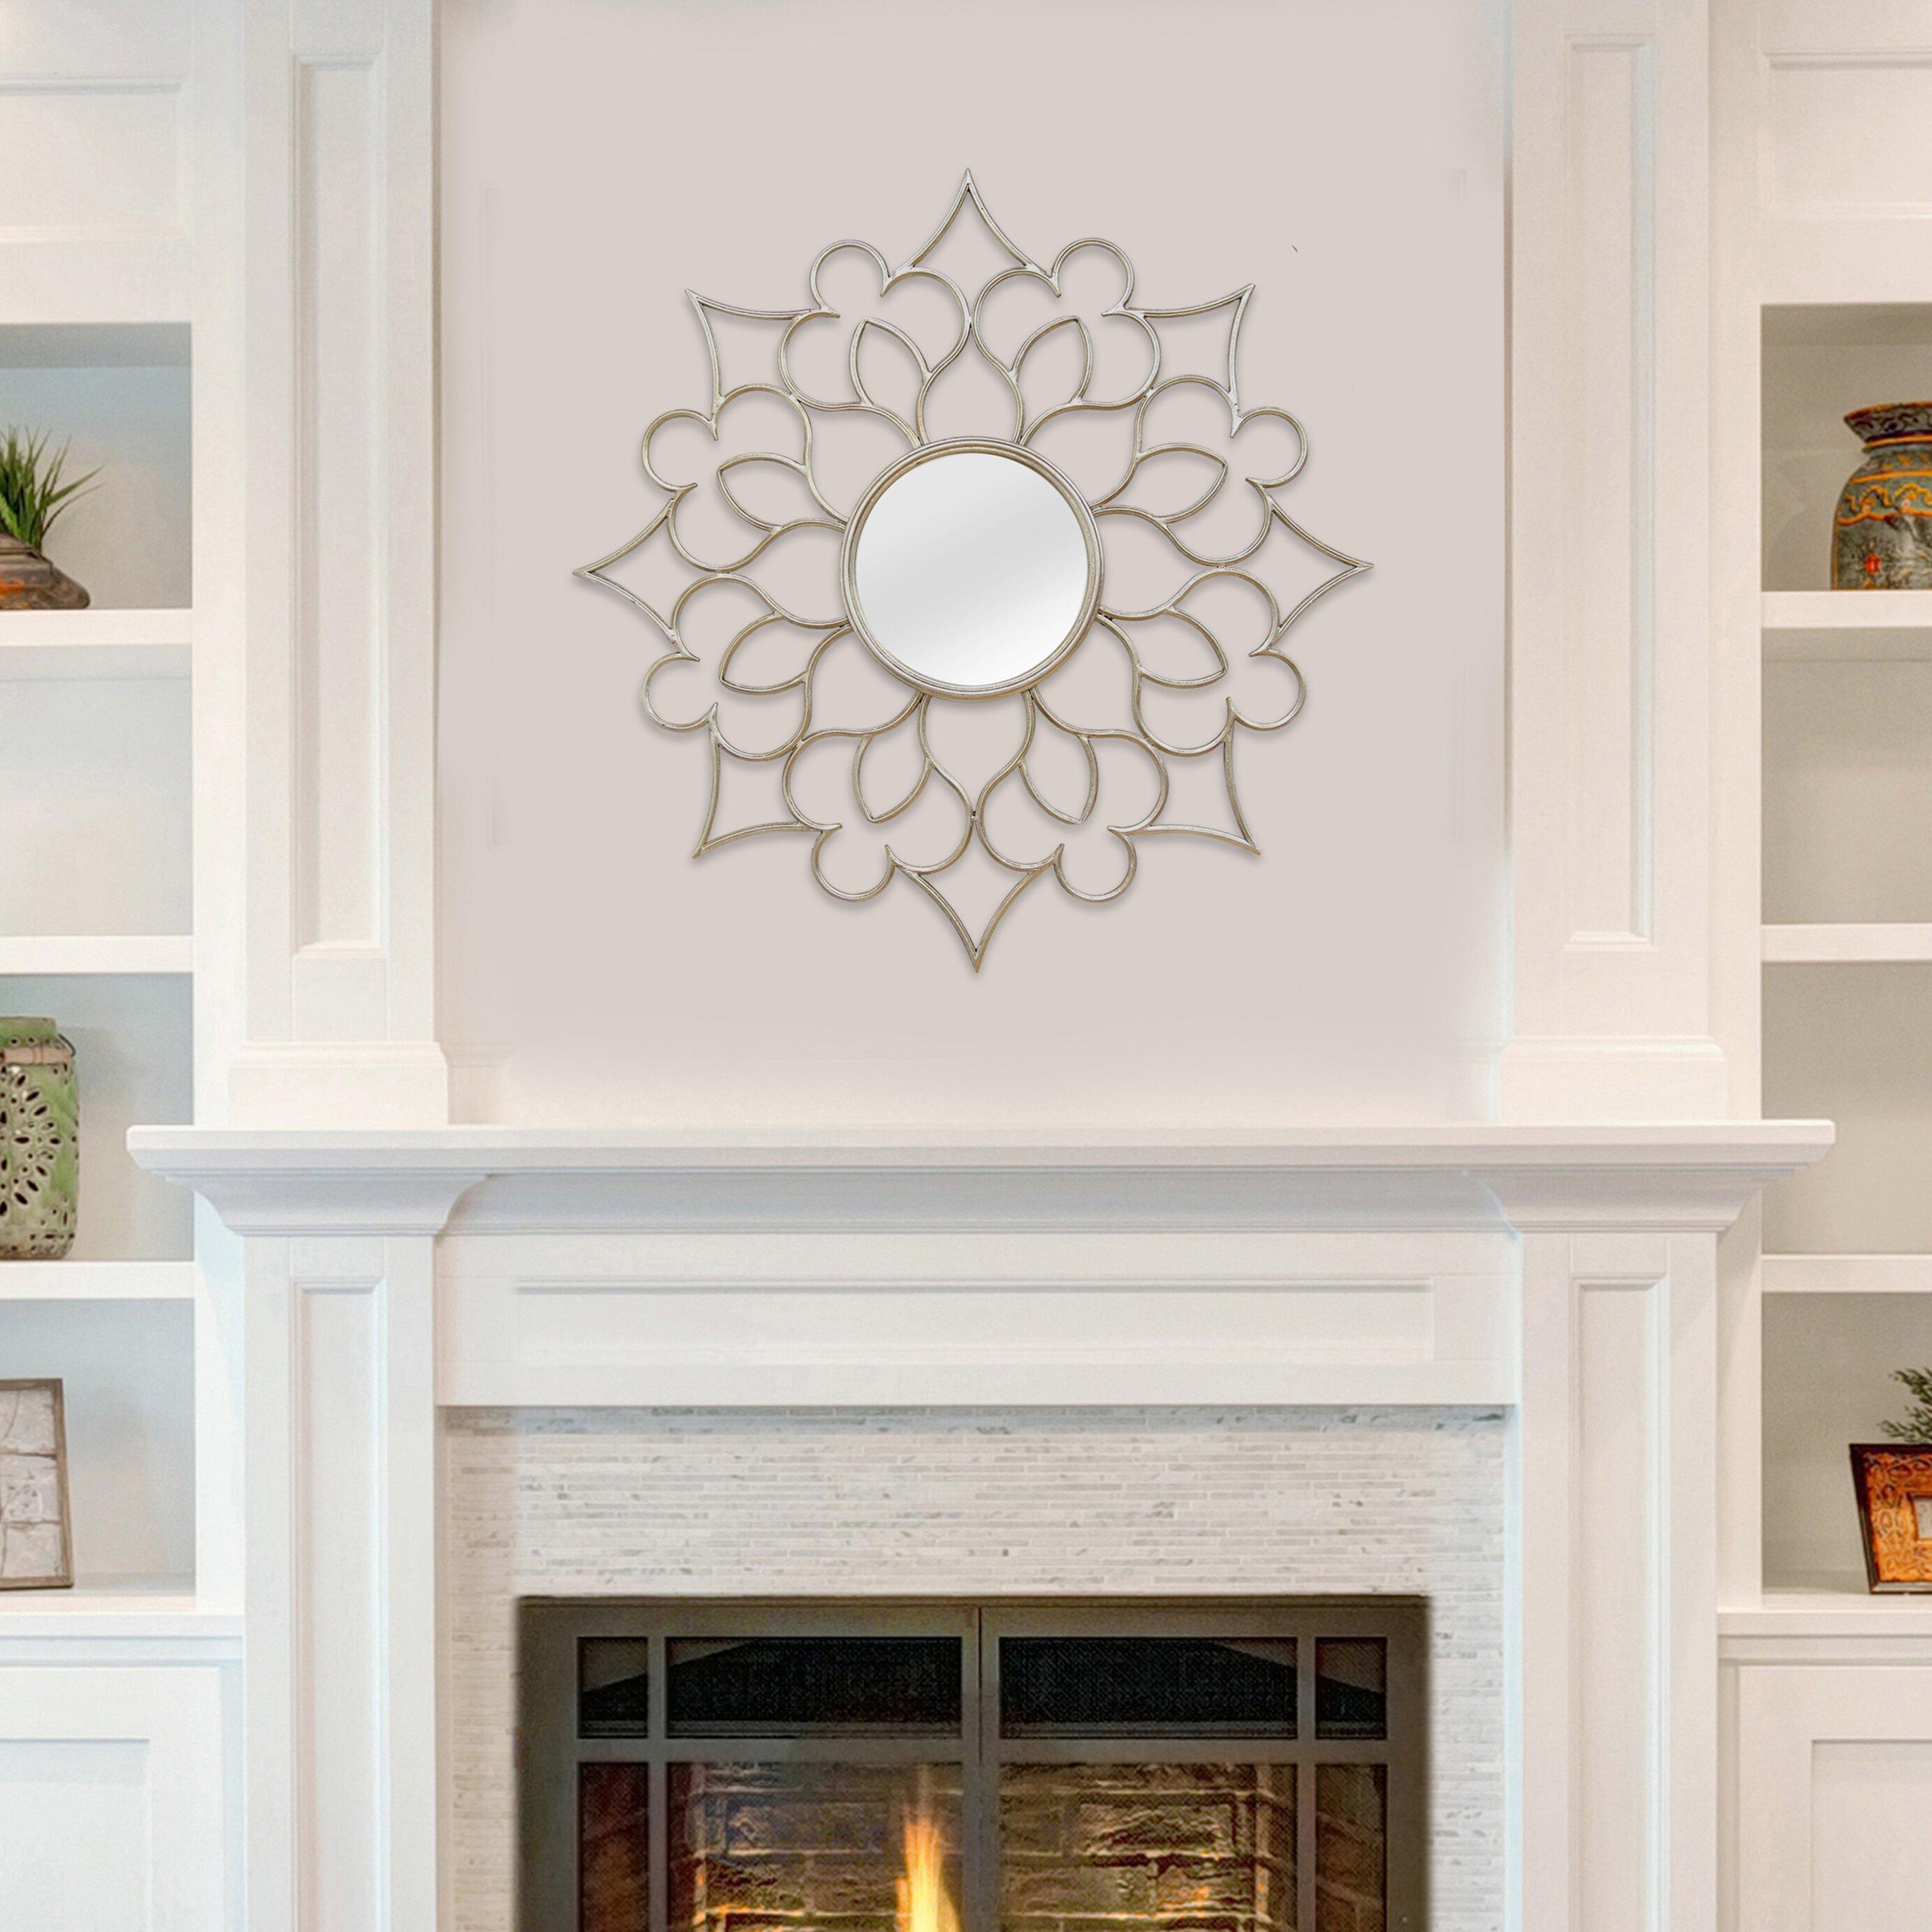 Stratton Home Decor Baroque Wall Mirror : Stratton home decor francesca wall mirror reviews wayfair